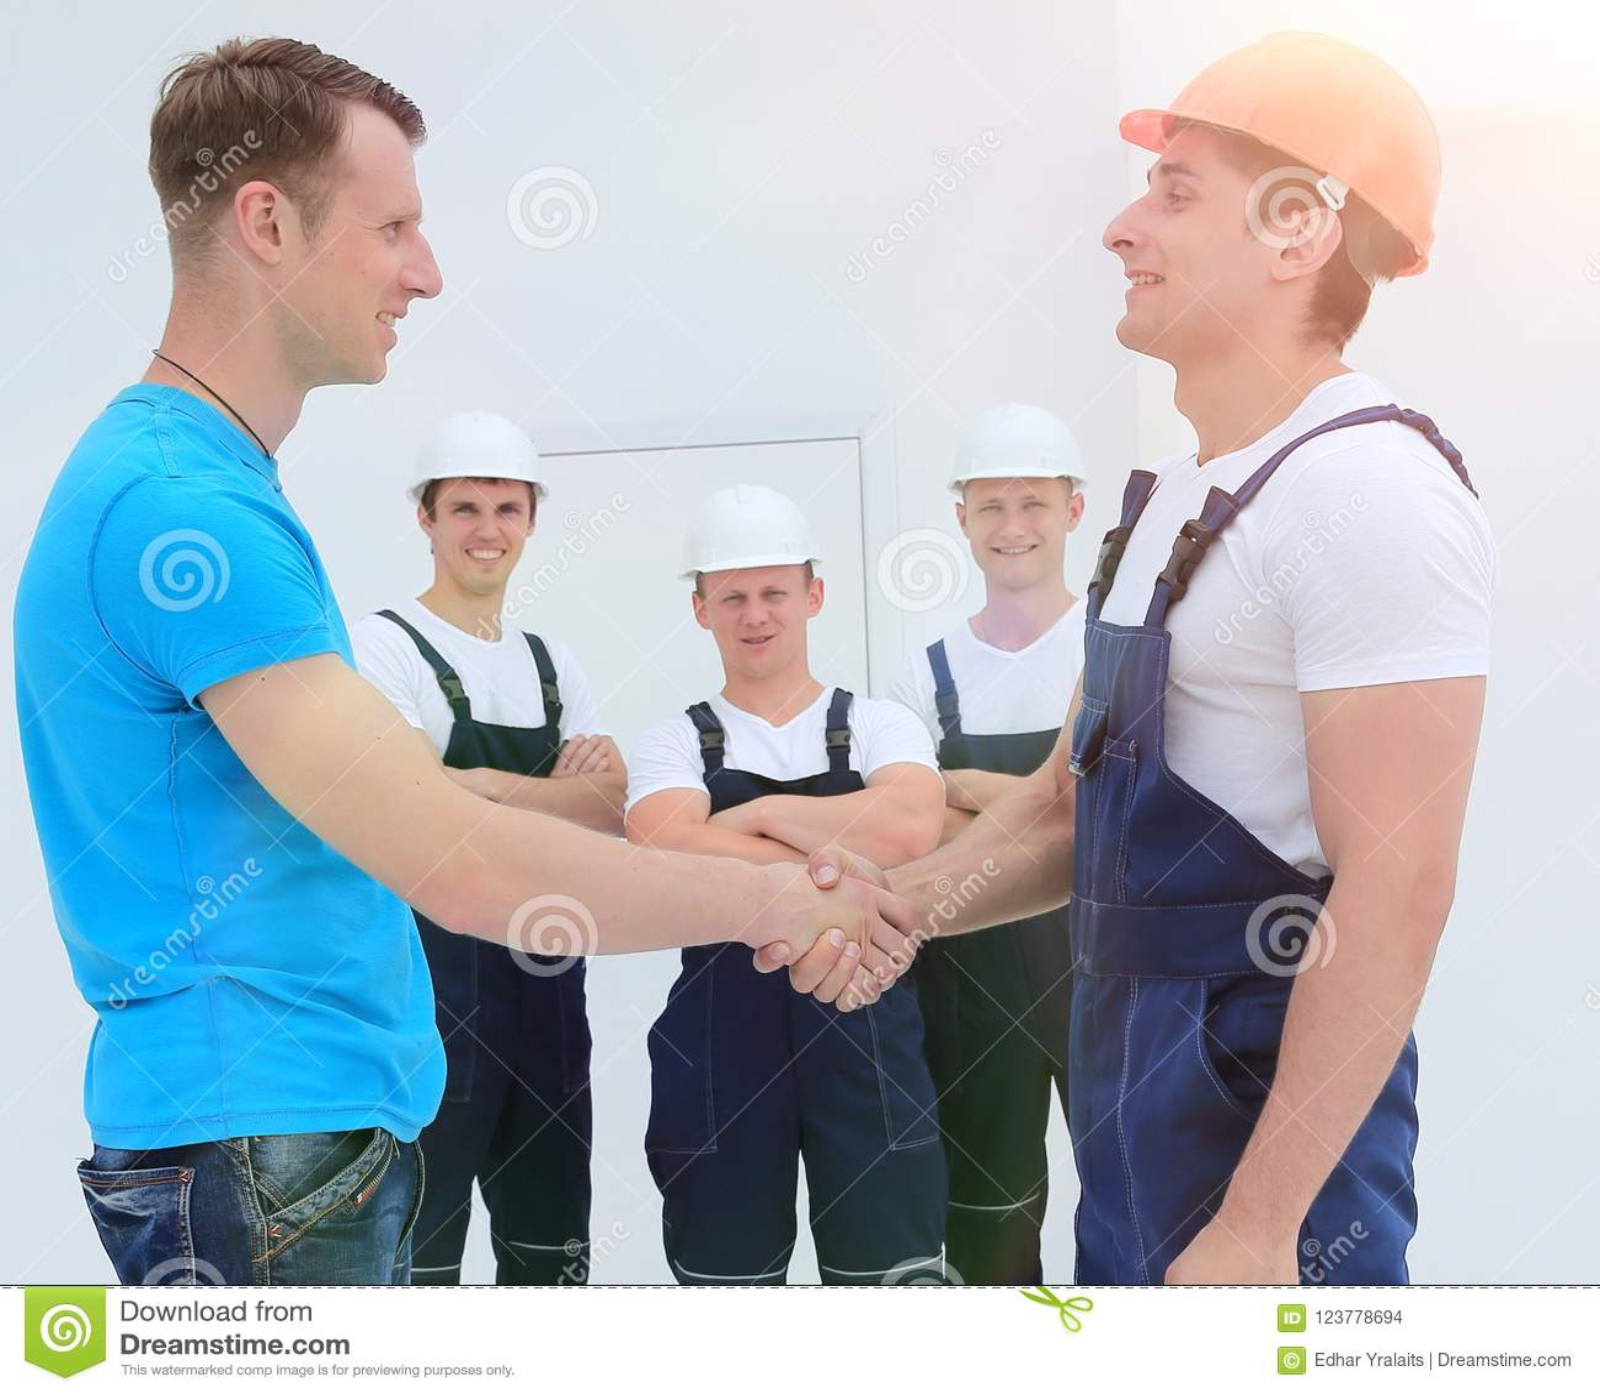 Handshake of the architect and engineer